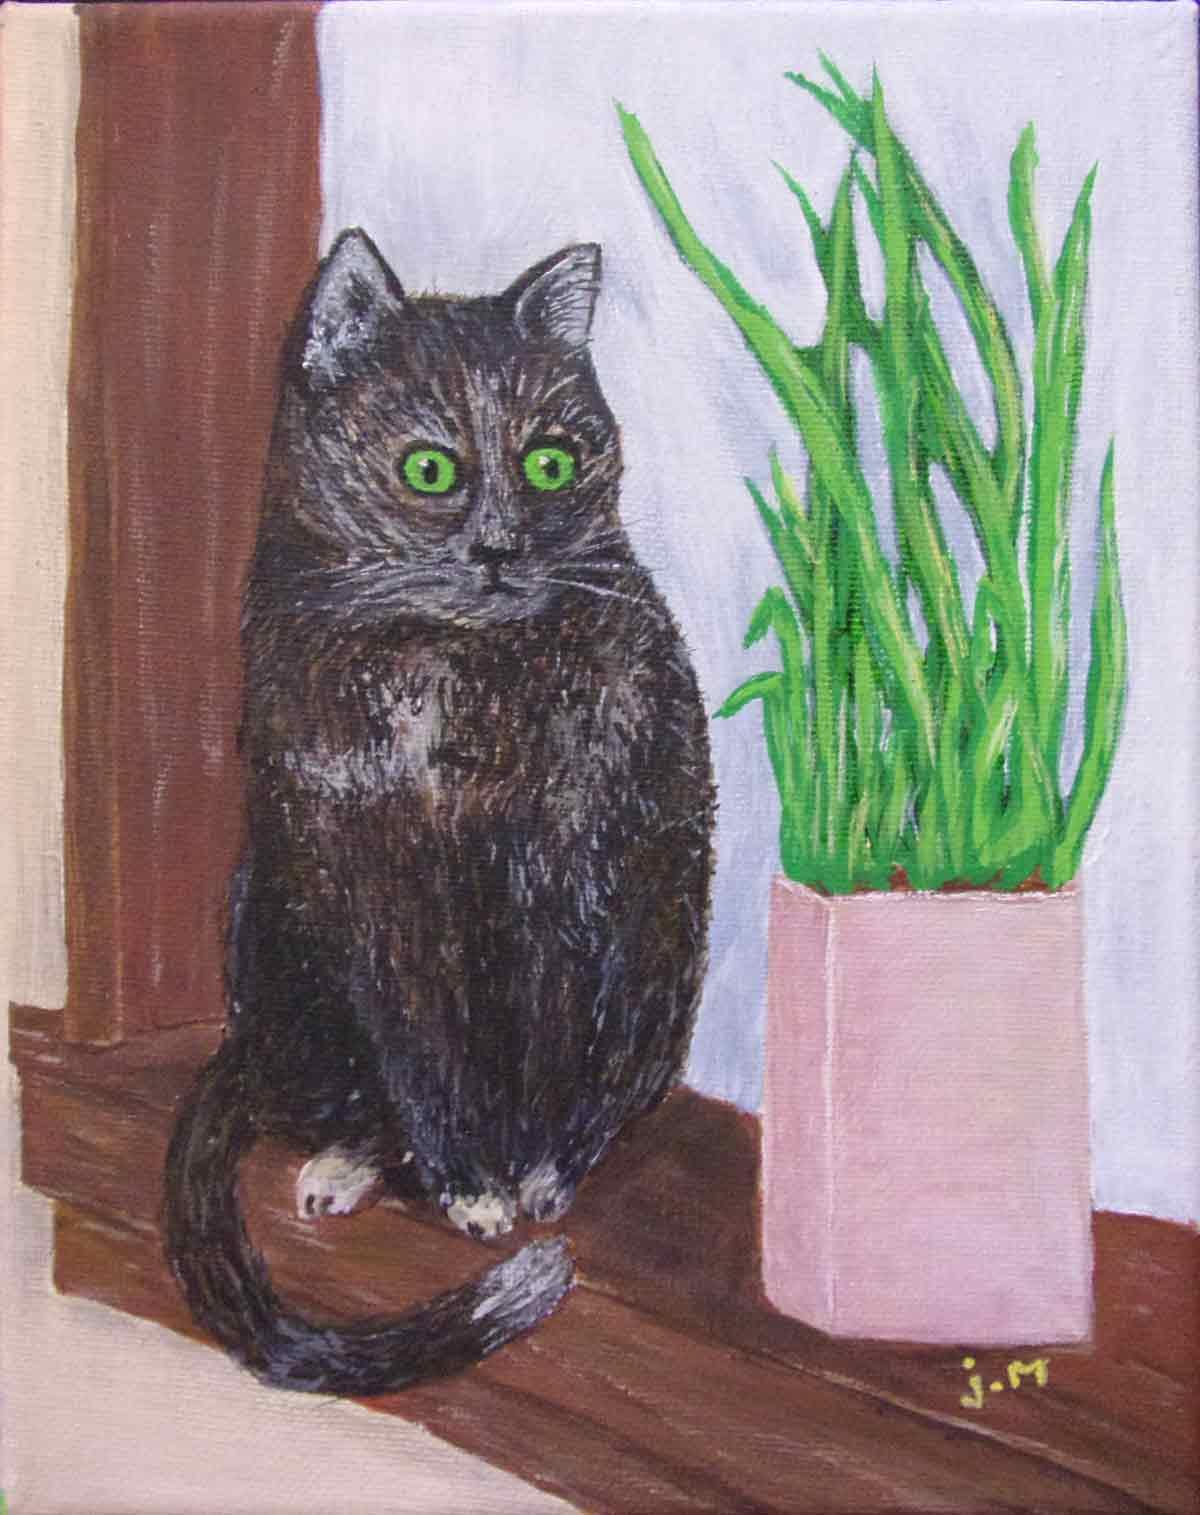 Sparrow, Office Cat, applying an artist's talent for keen observation.